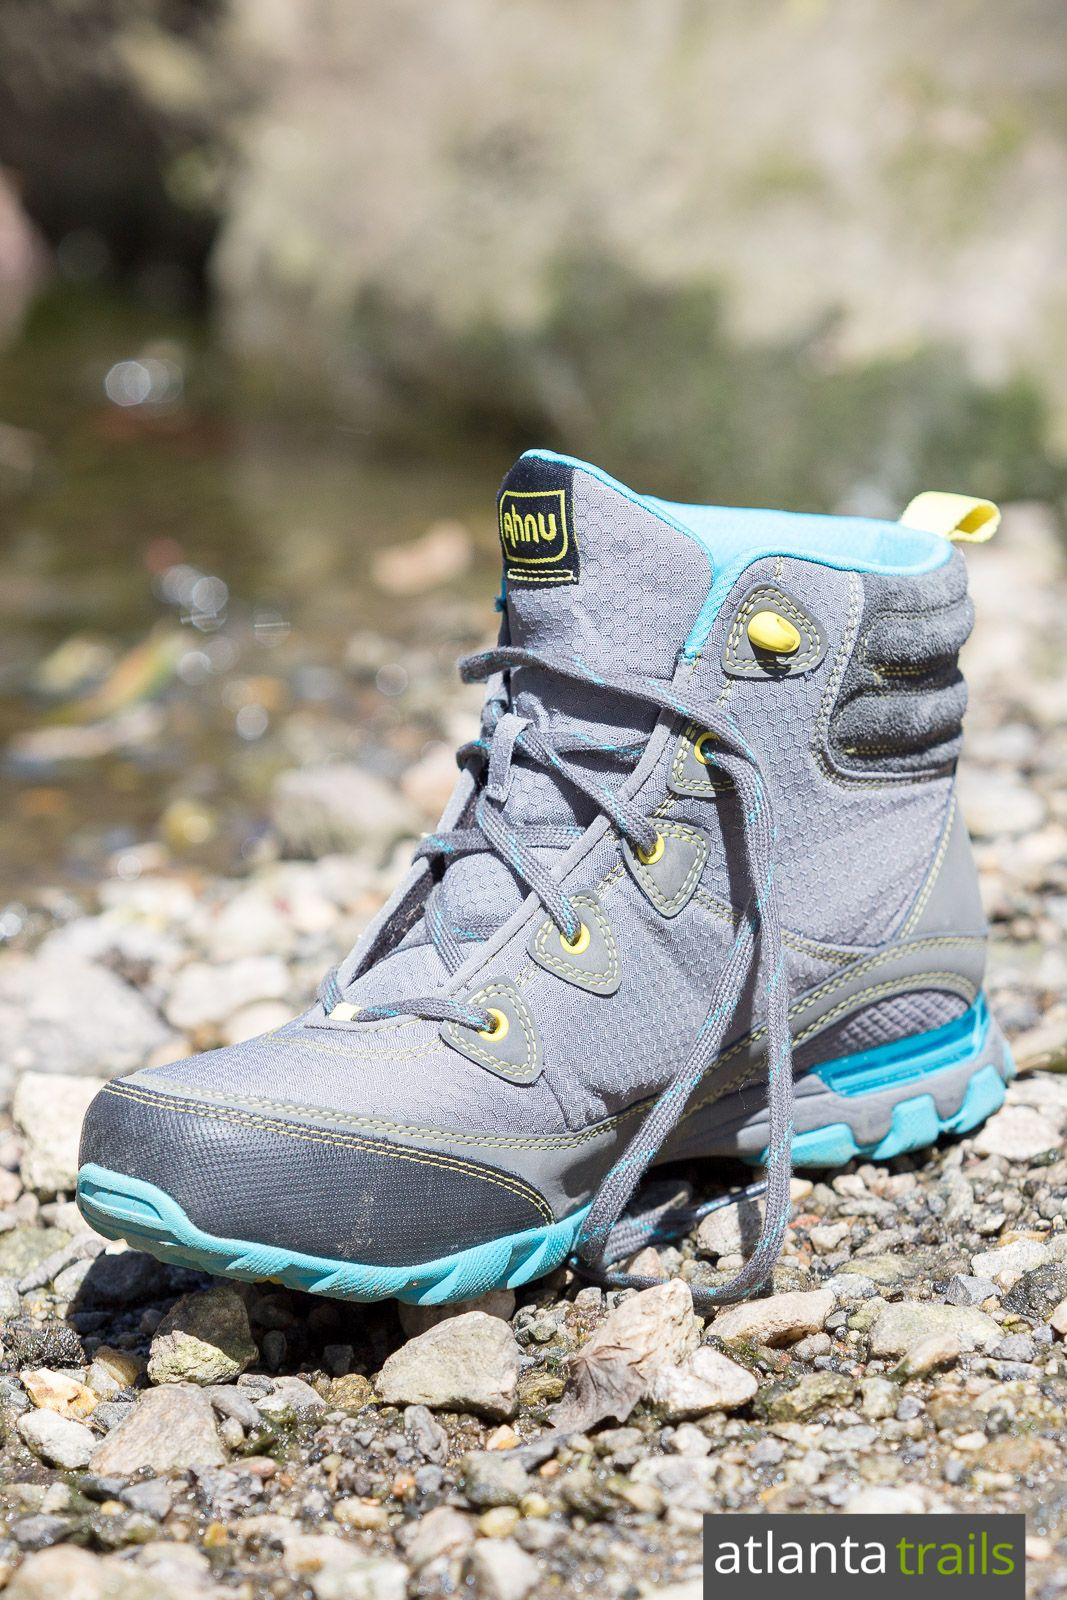 d7f3df9d5 Ahnu Sugarpine Women s Hiking Boot Review.  ahnufootwear